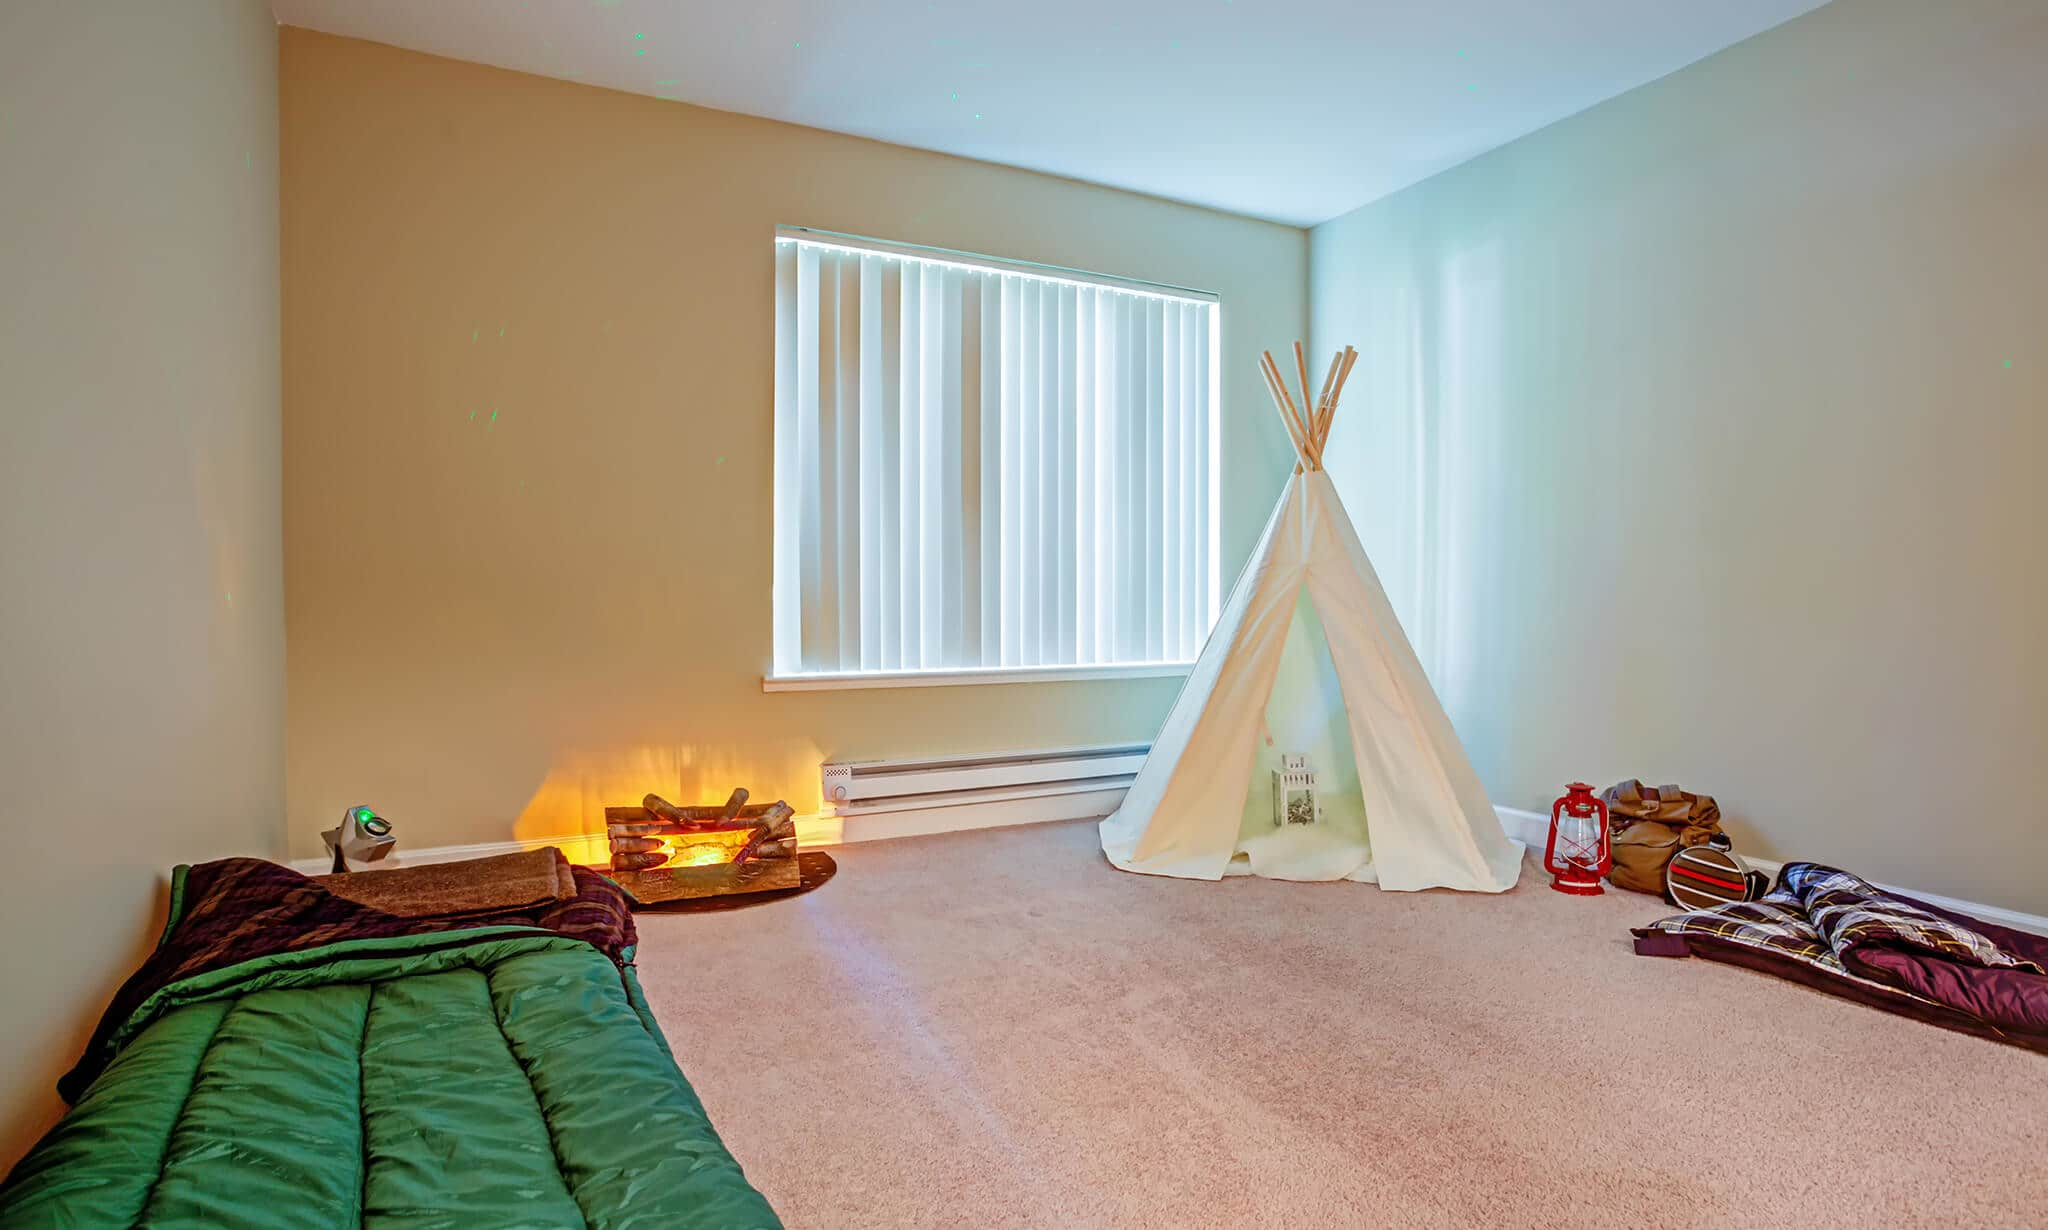 Timberleaf Apartments apartments in Santa Clara CA to rent photo 12